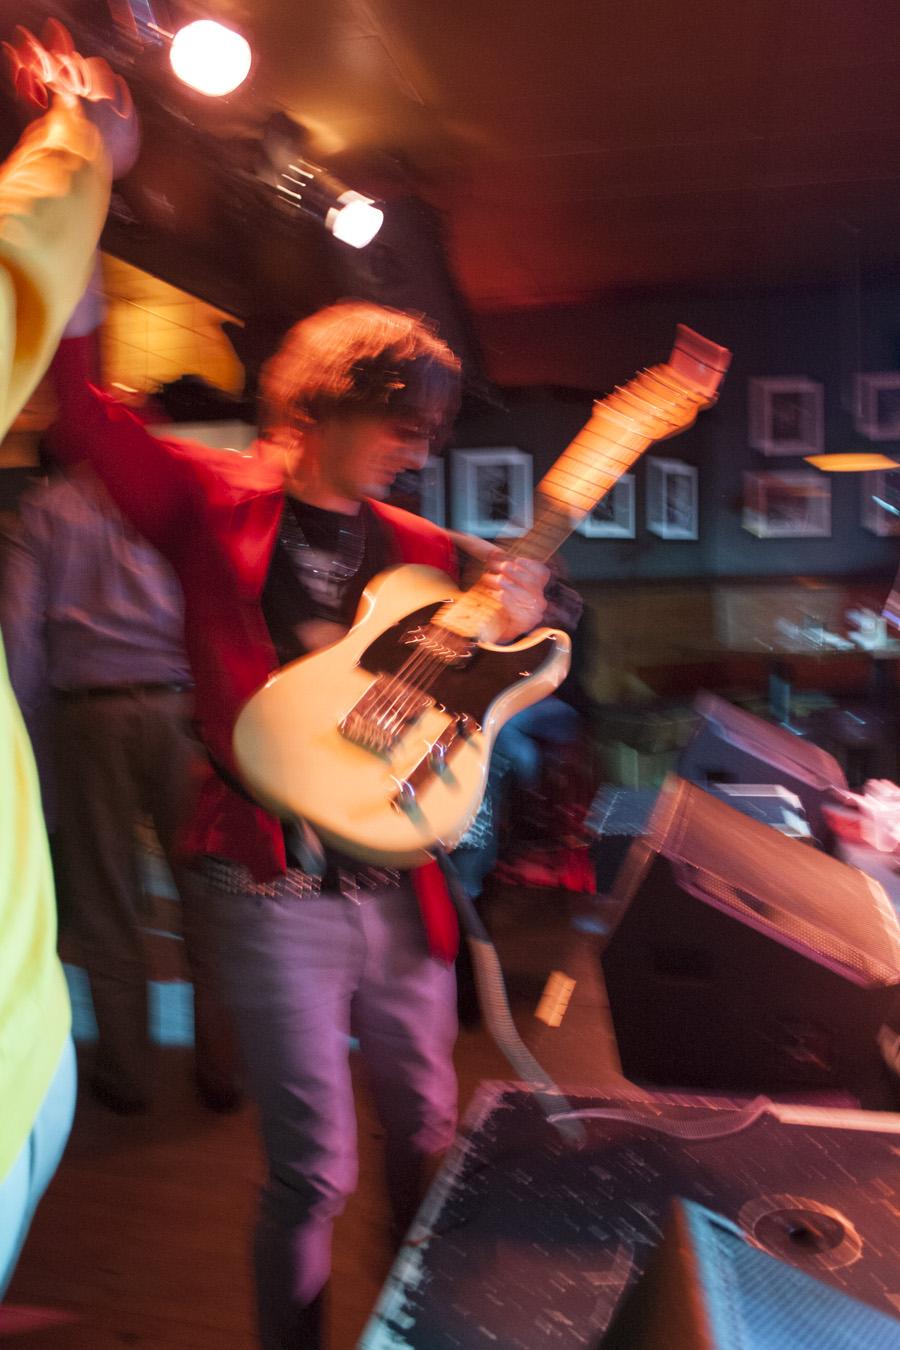 Surprise gig! Sat July 25 at the Narrows Saloon